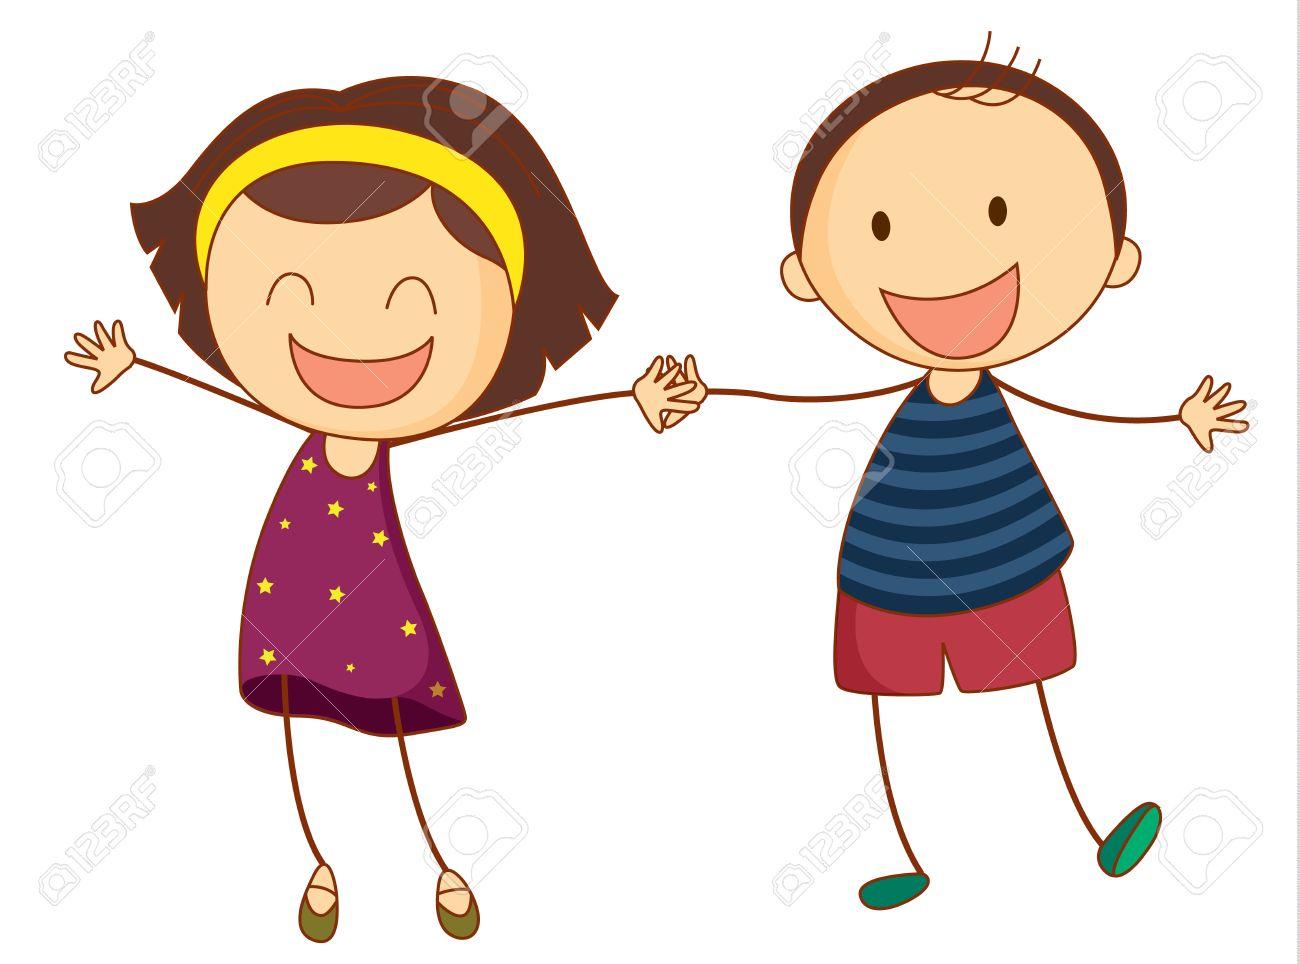 illustration of 2 girls holding hands royalty free cliparts vectors rh 123rf com